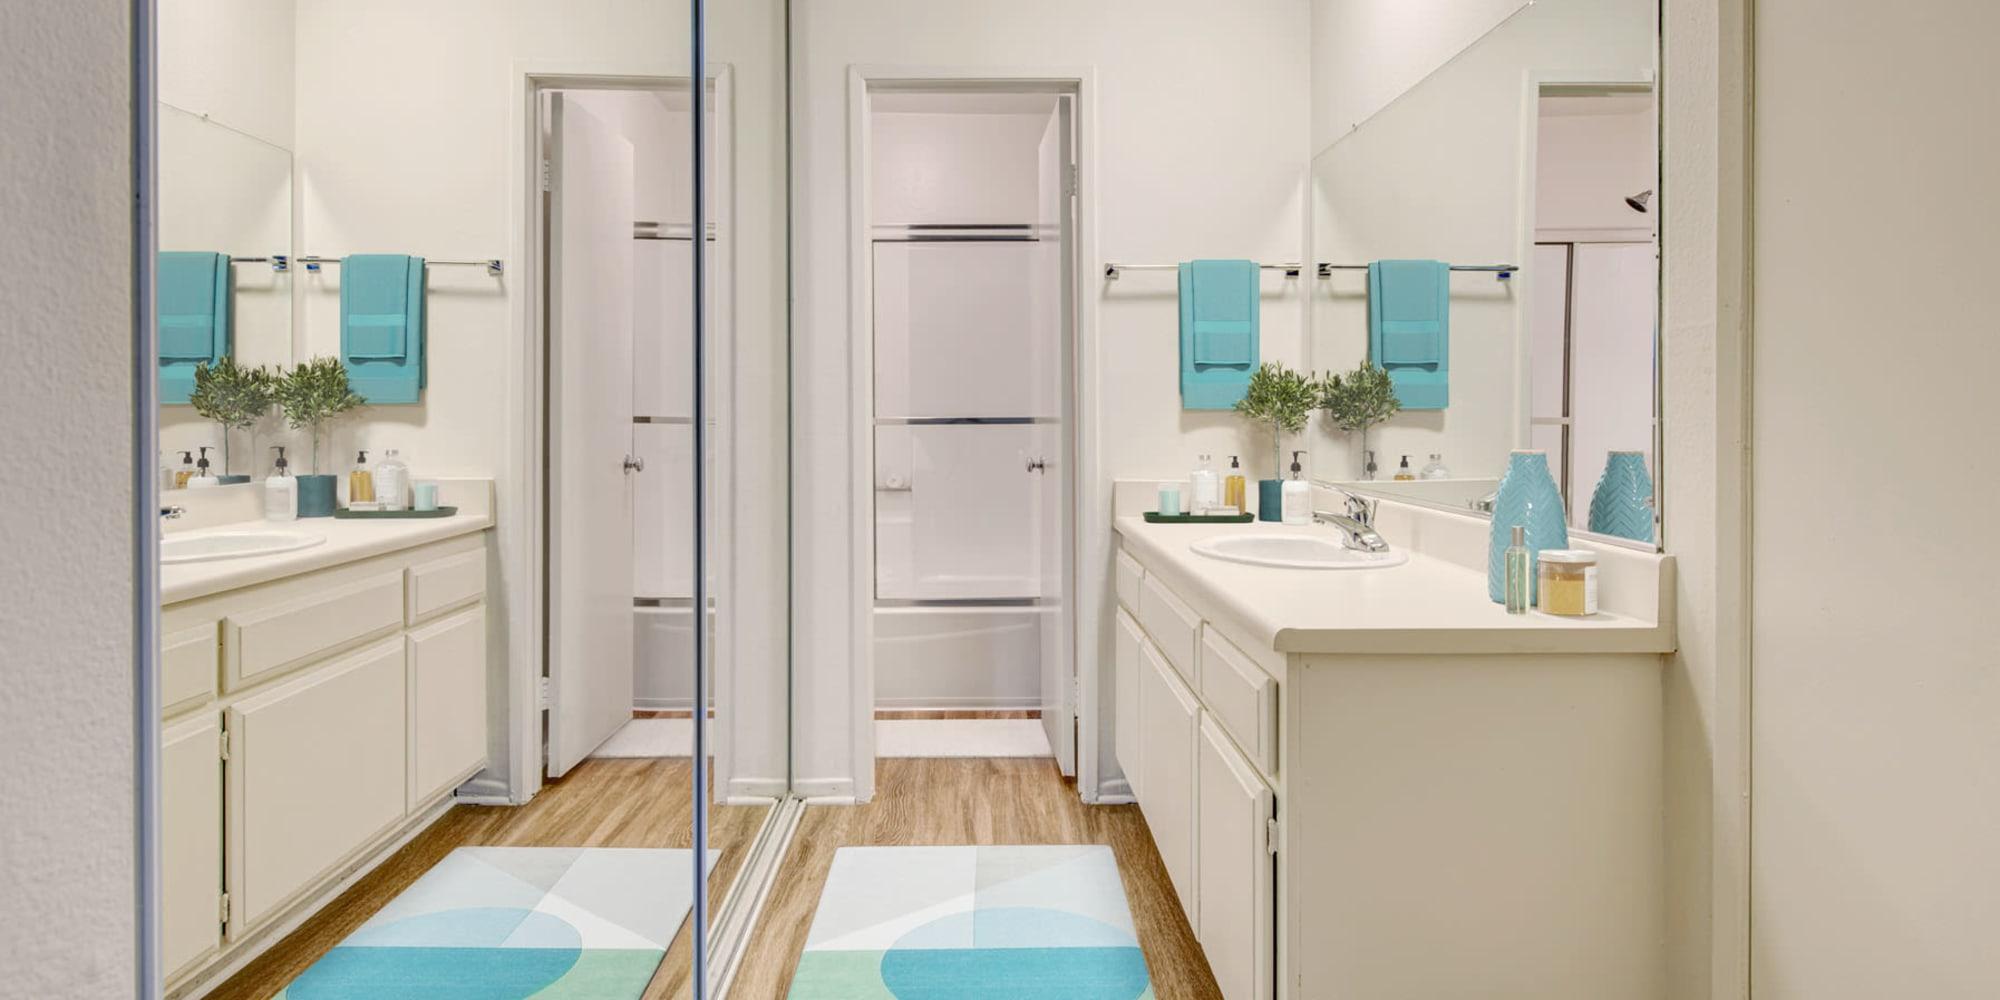 Mirrored closet doors in a model apartment's bathroom at Village Pointe in Northridge, California